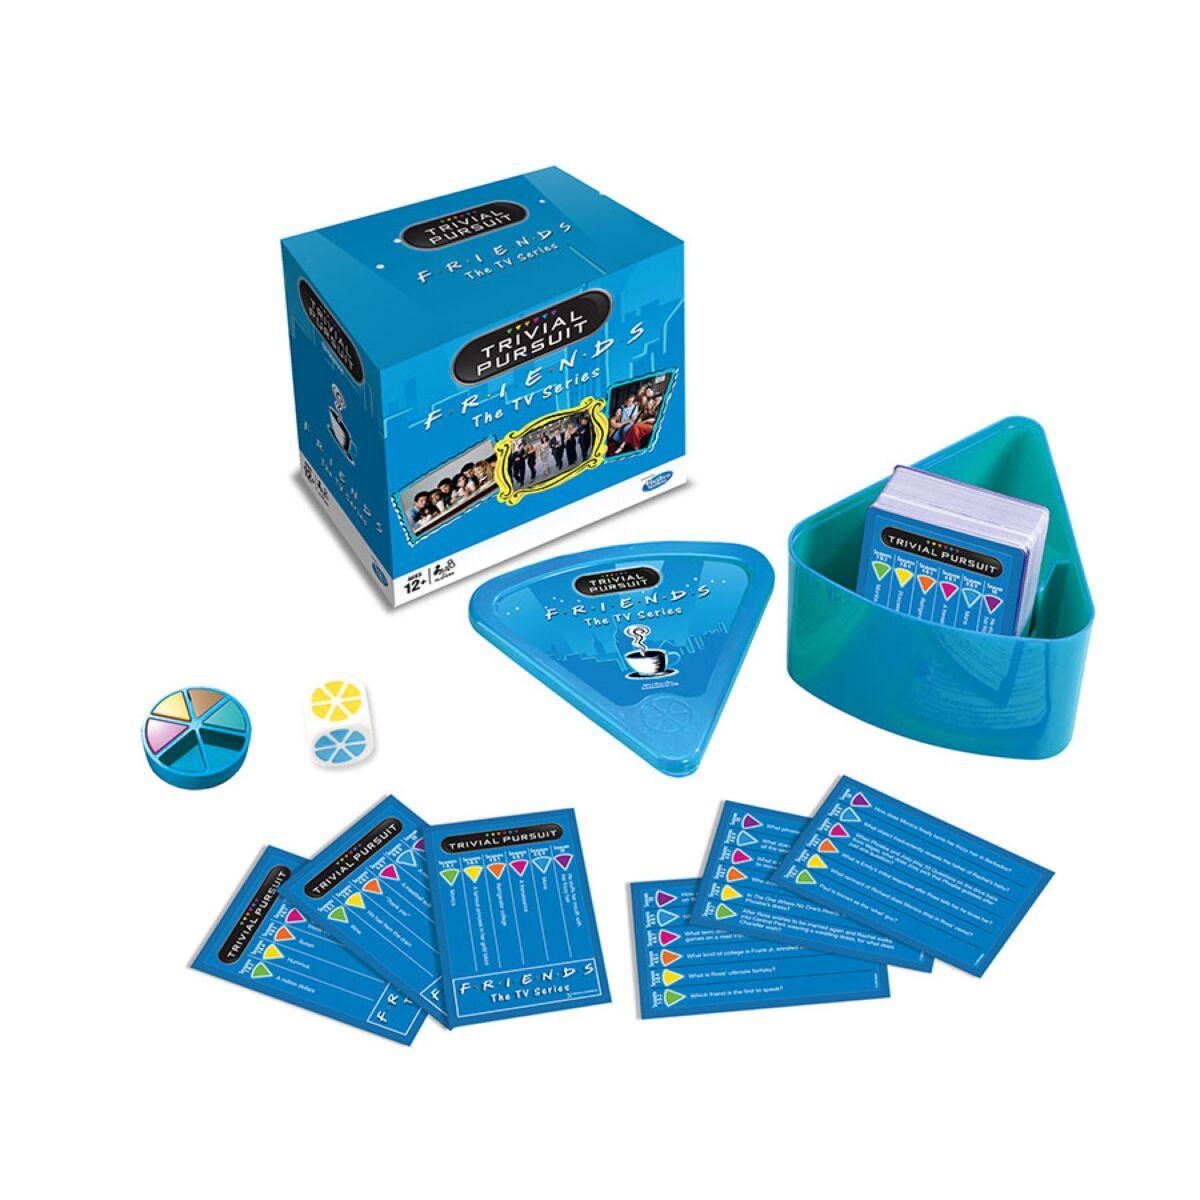 Friends Bitesize Trivial Pursuit £7.49 / Monopoly £14.99 at Robert Dyas free c&c